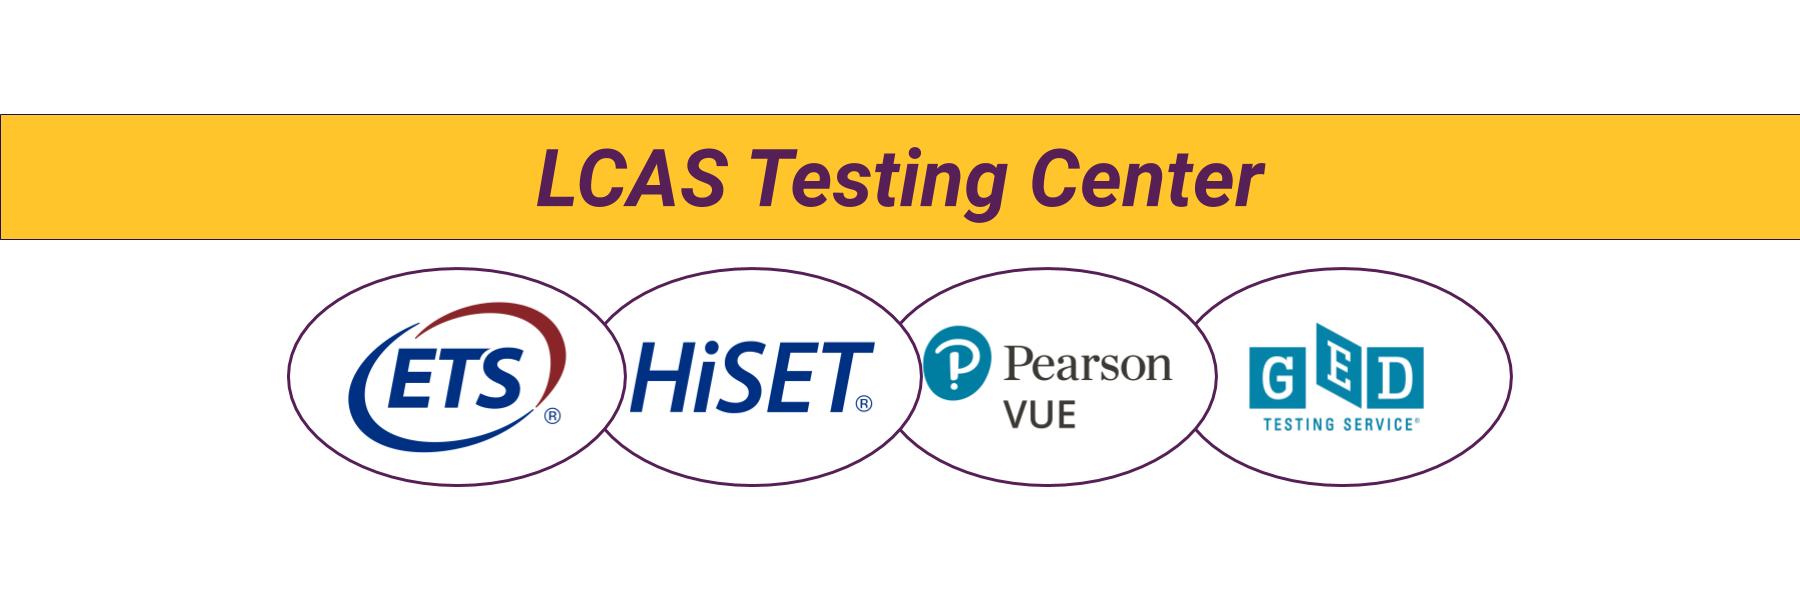 LCAS Testing Center